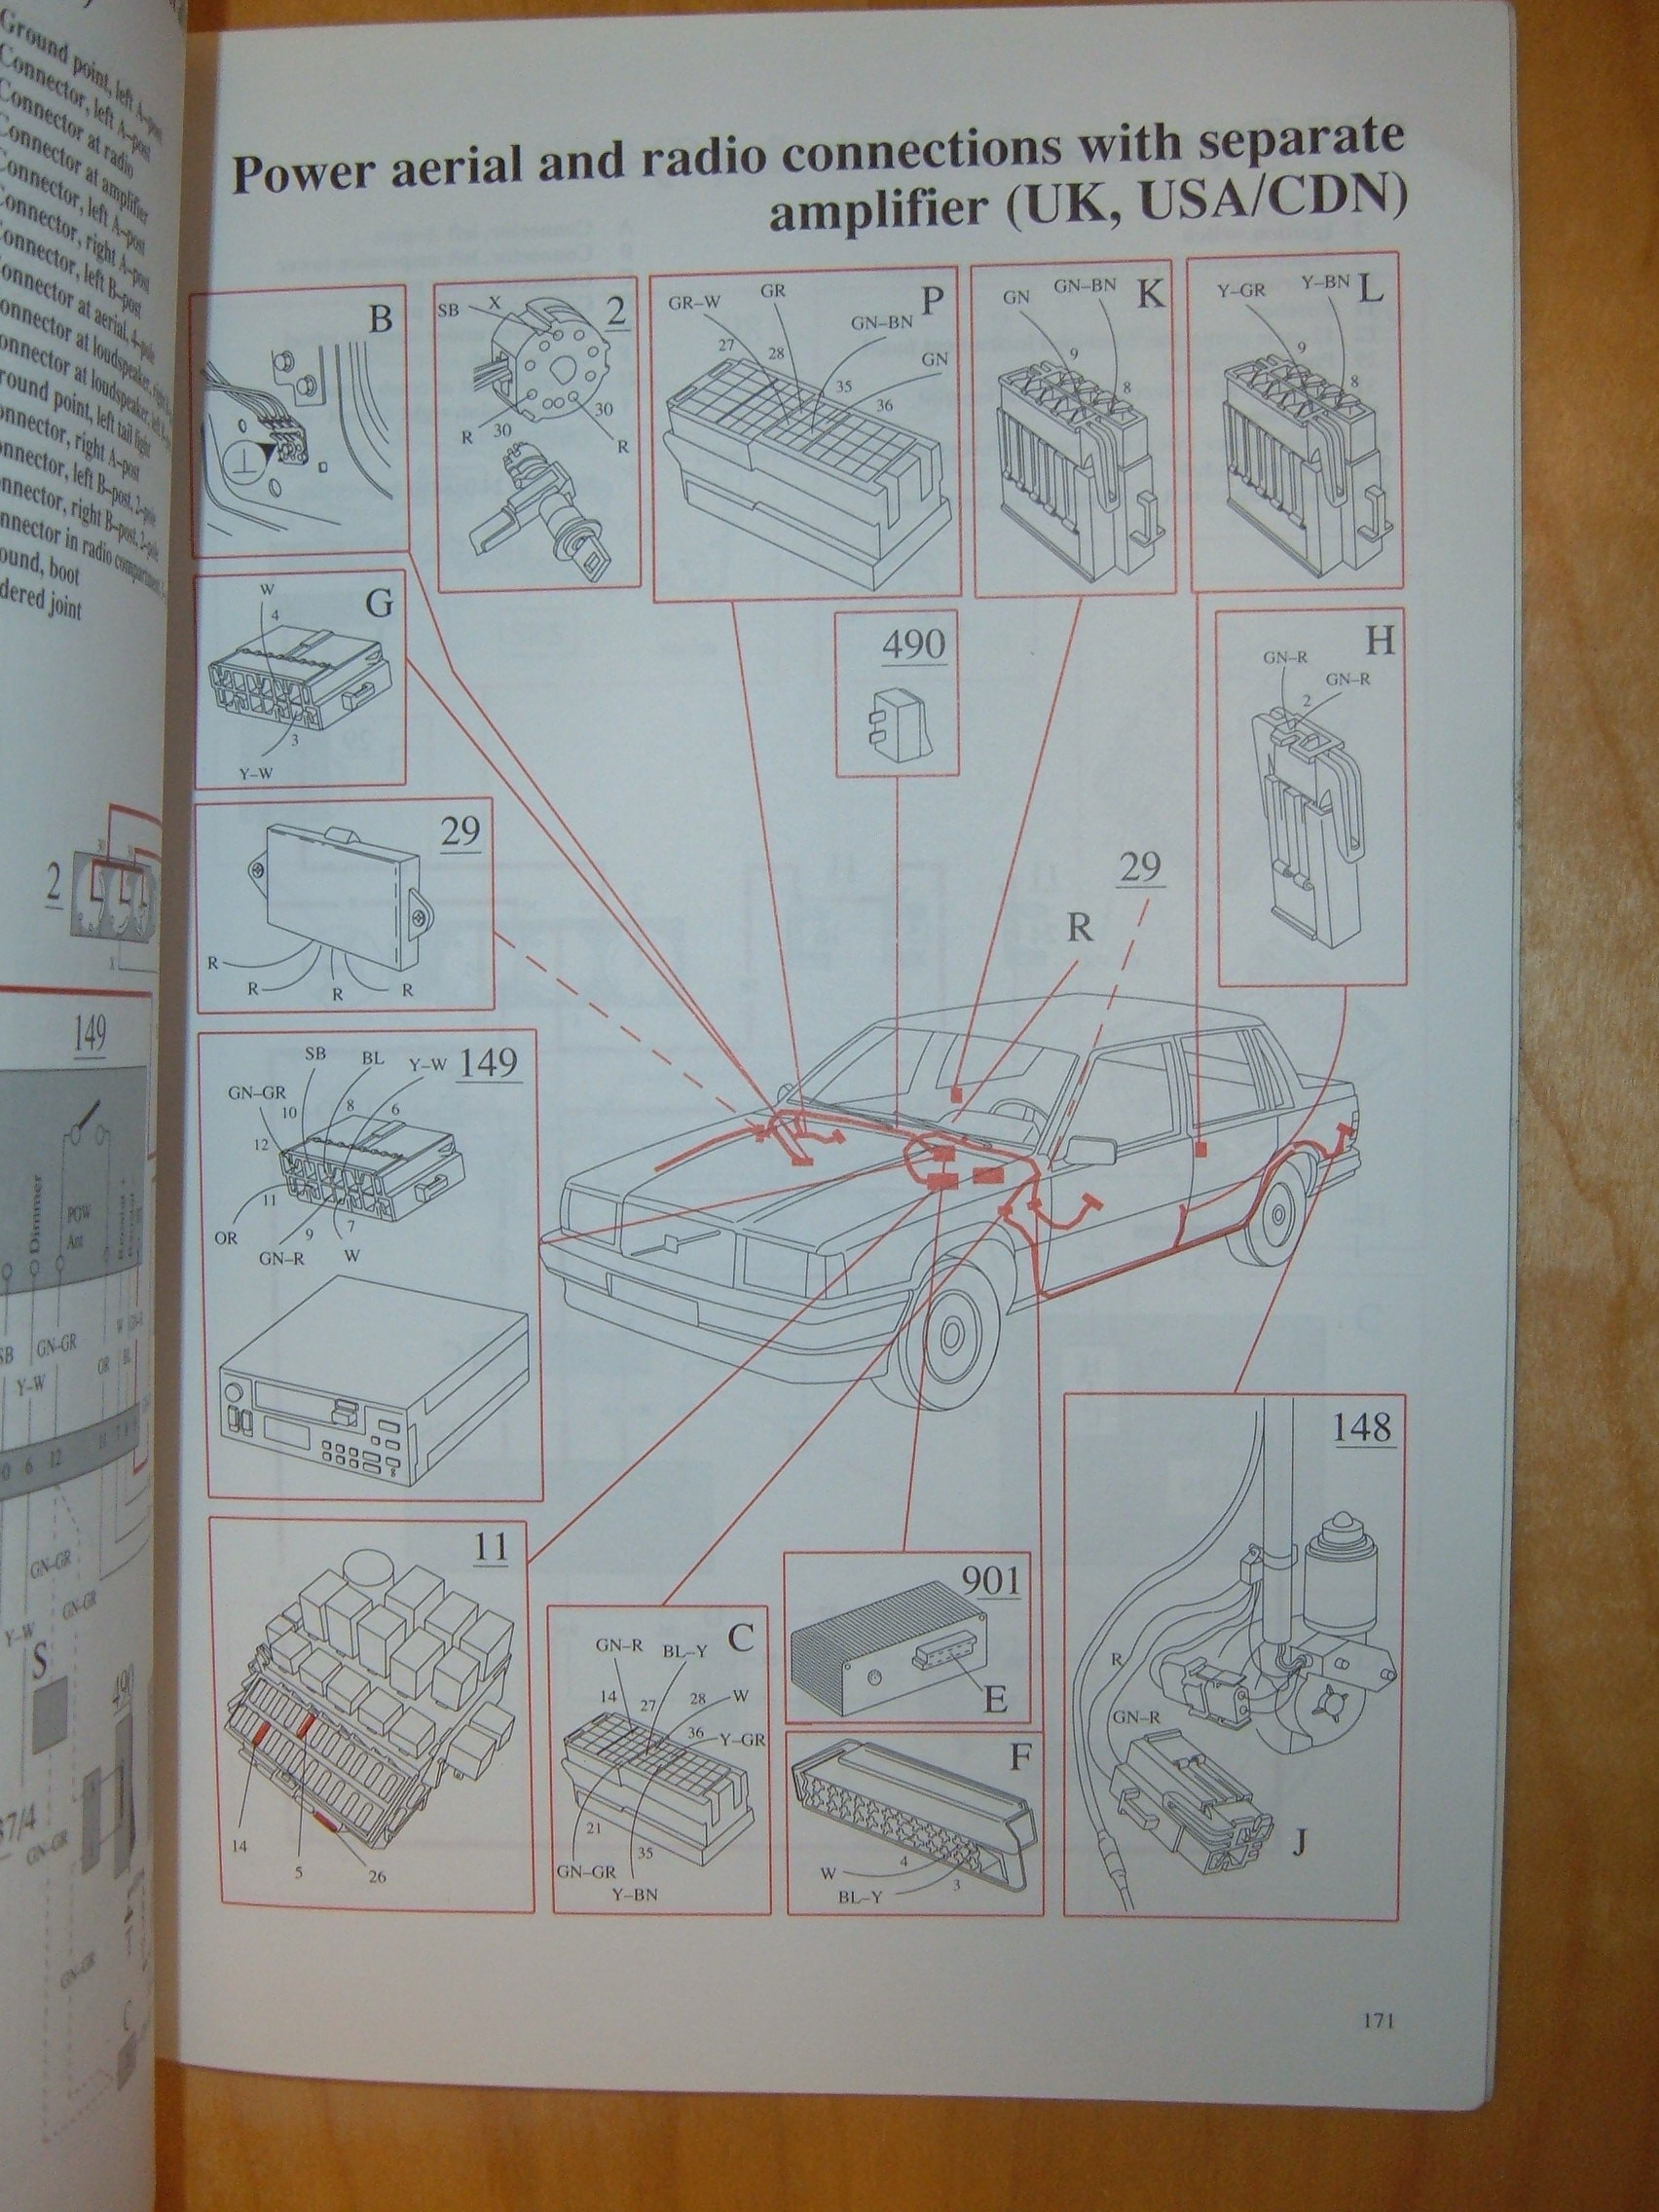 Wiring Diagram Uk 1989 Fzr1000